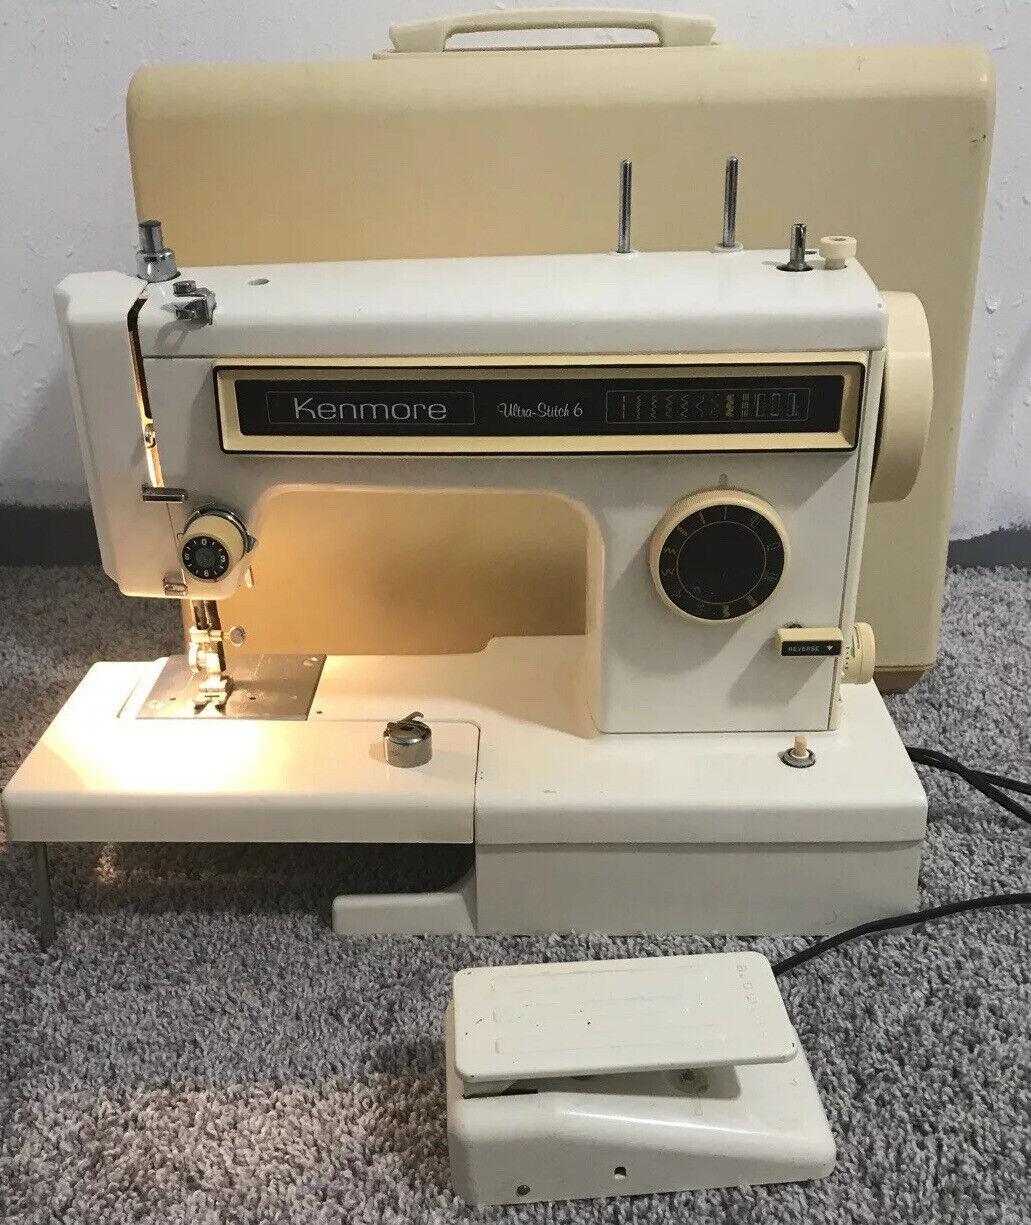 s l1600 - Sears Kenmore 158.1340280 Ultra Stitch 6 Sewing Machine & Pedal Free Arm ZigZag